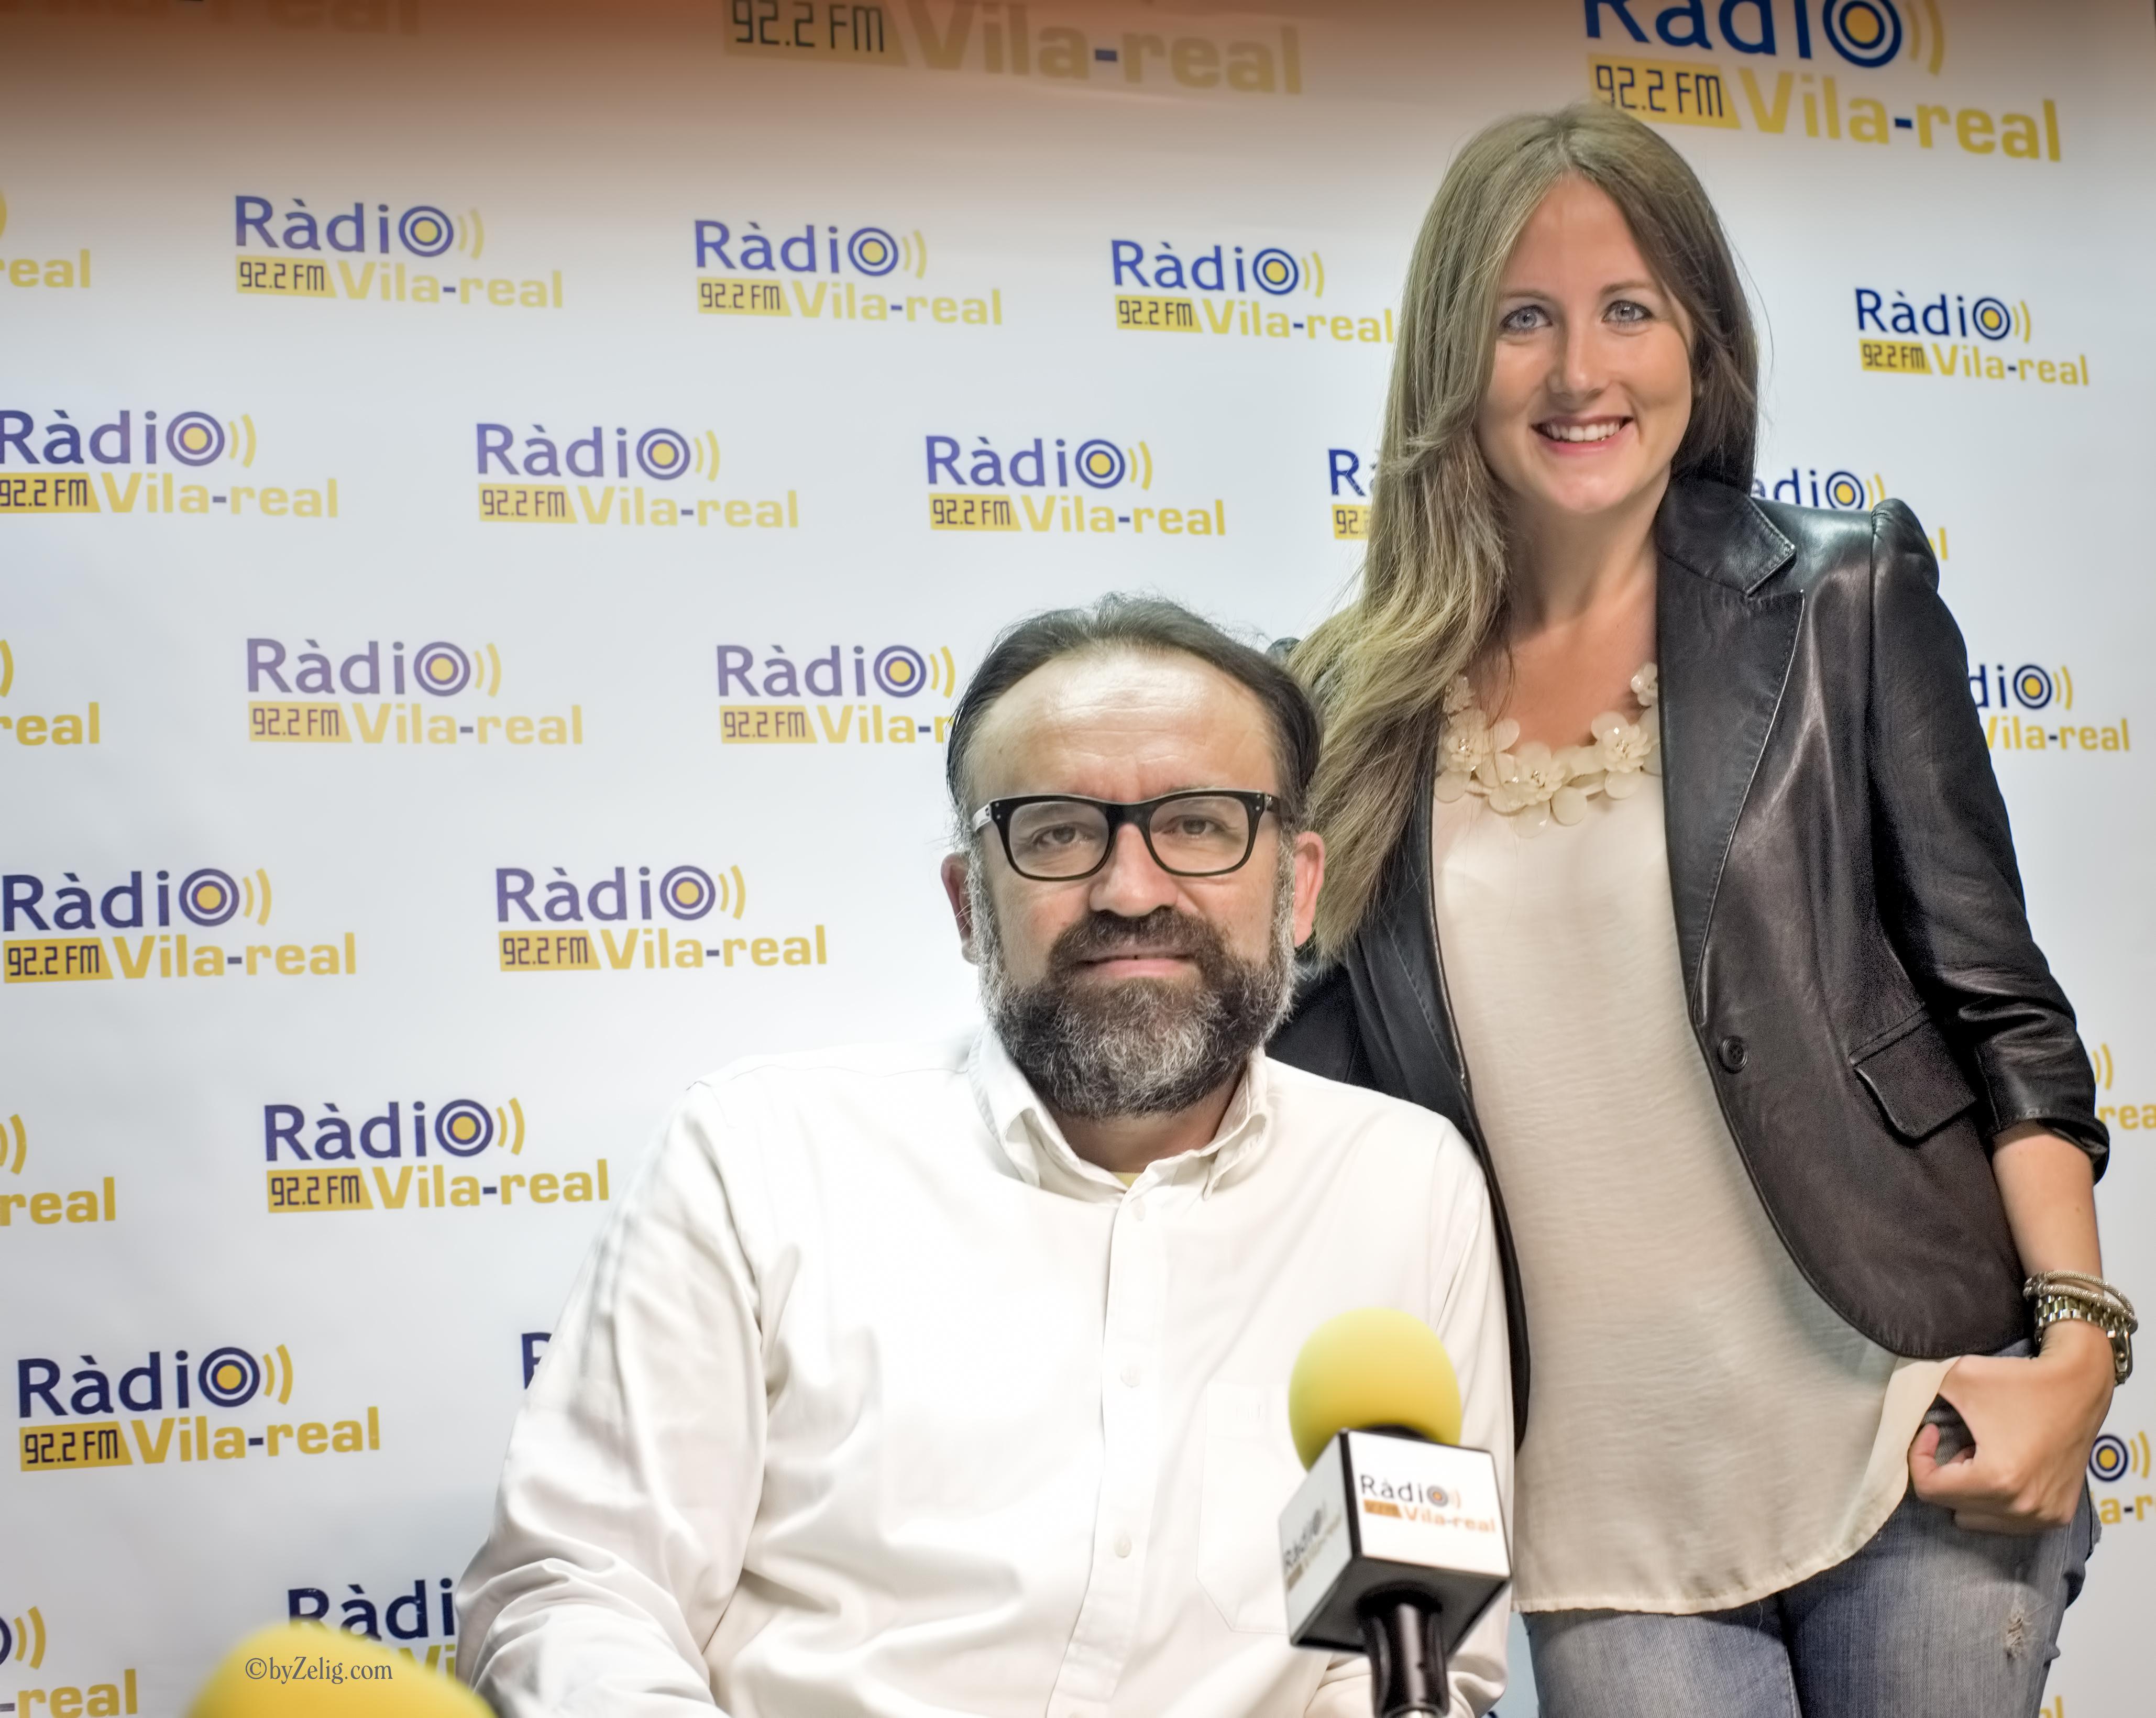 Esports Radio Vila-real. Programa del 23 de febrero 2018